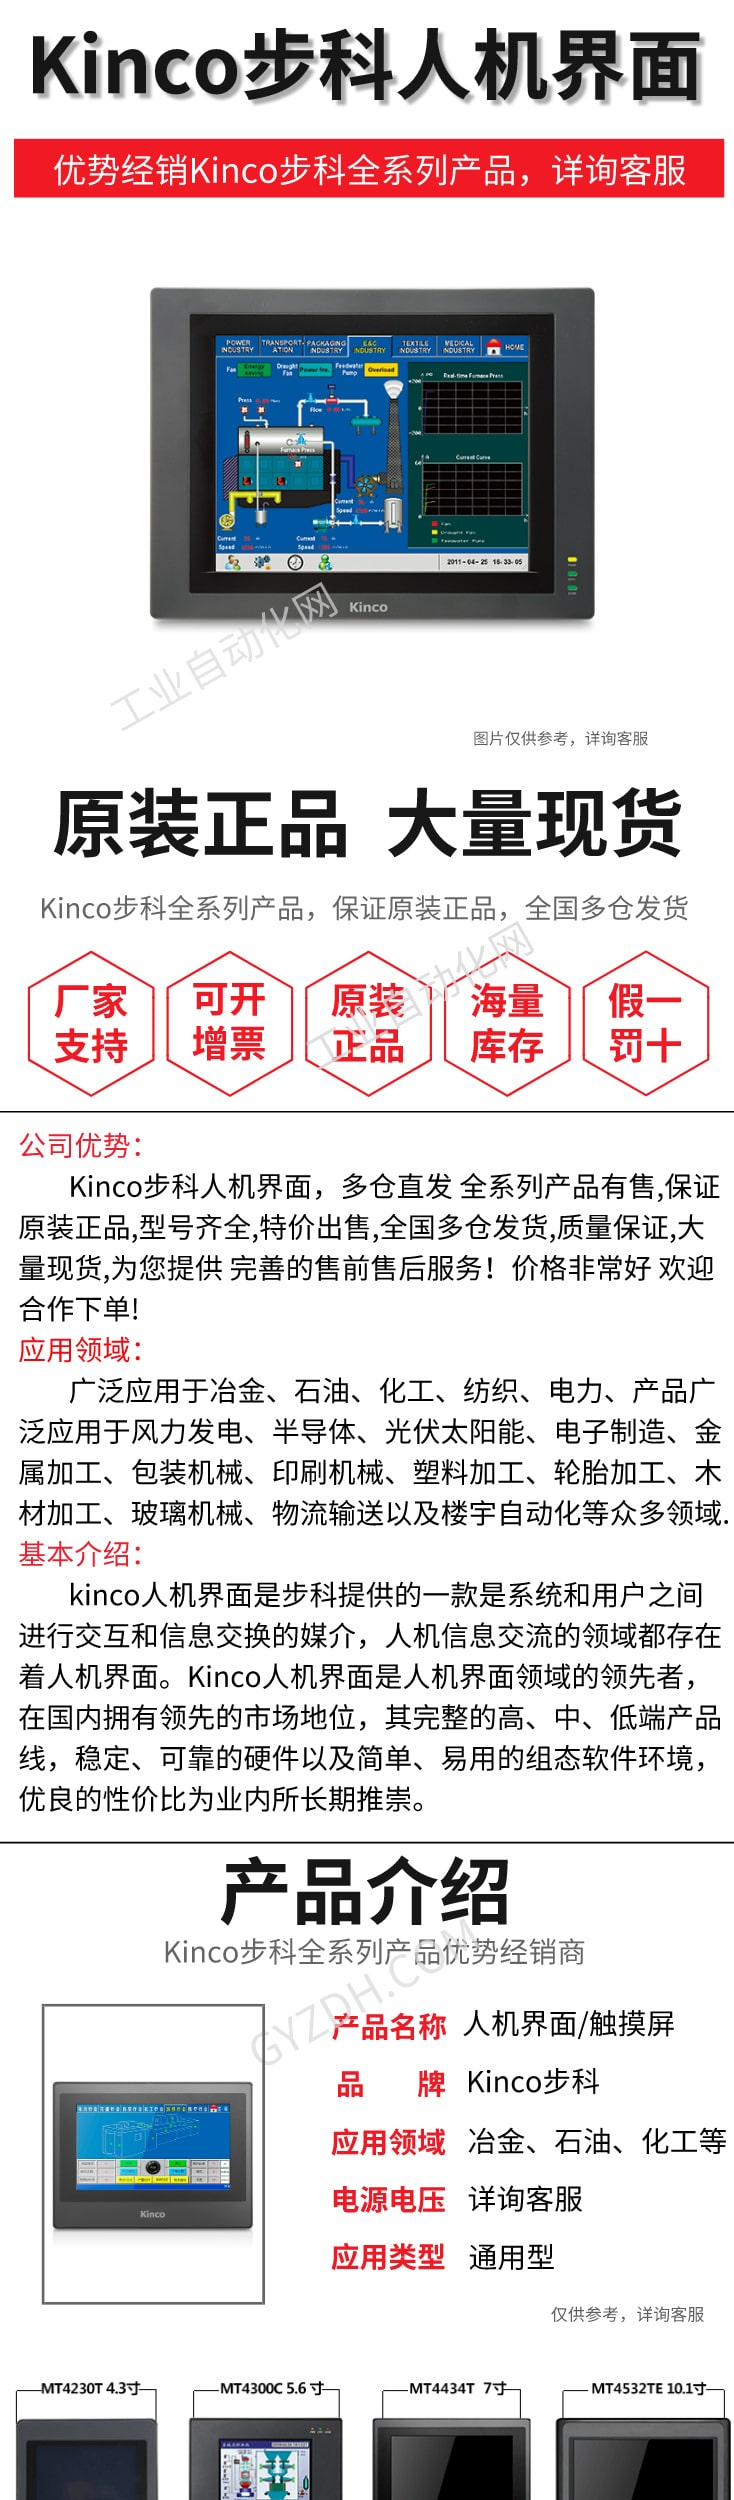 Kinco步科人机界面_自定义px_2019-12-11-0 (3)_副本-min.jpg